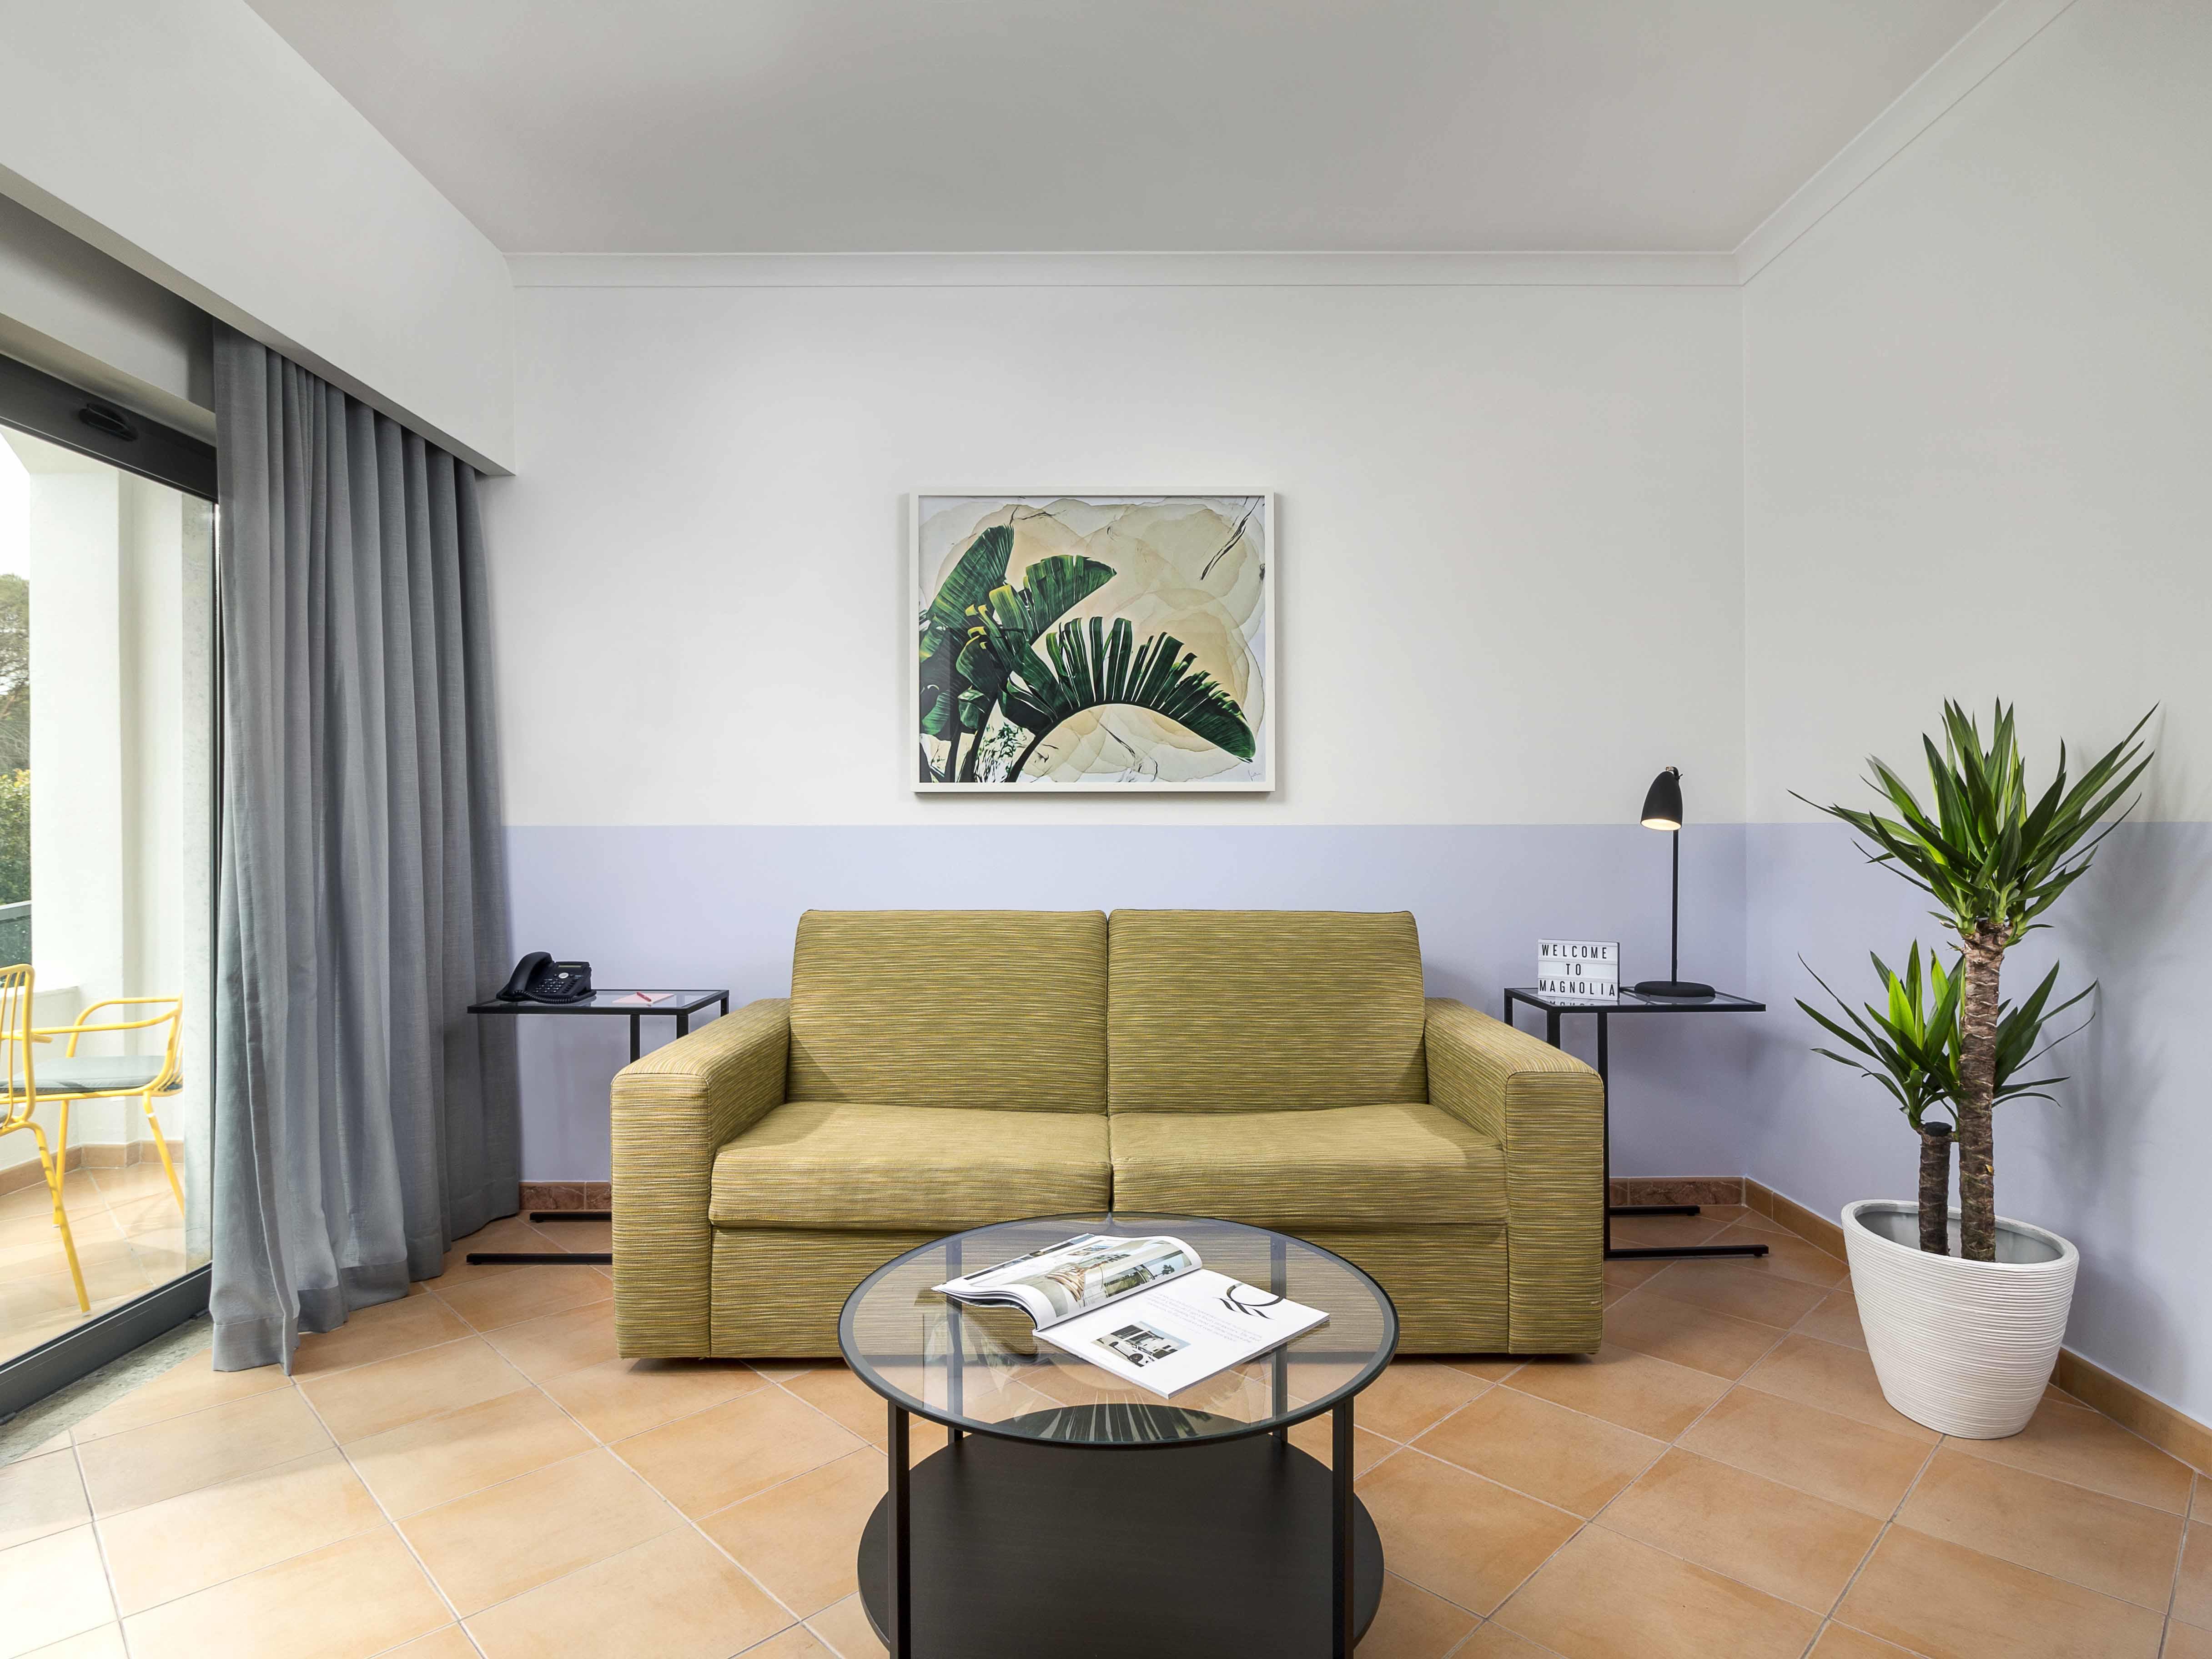 Sofa in the room - The Magnolia Hotel